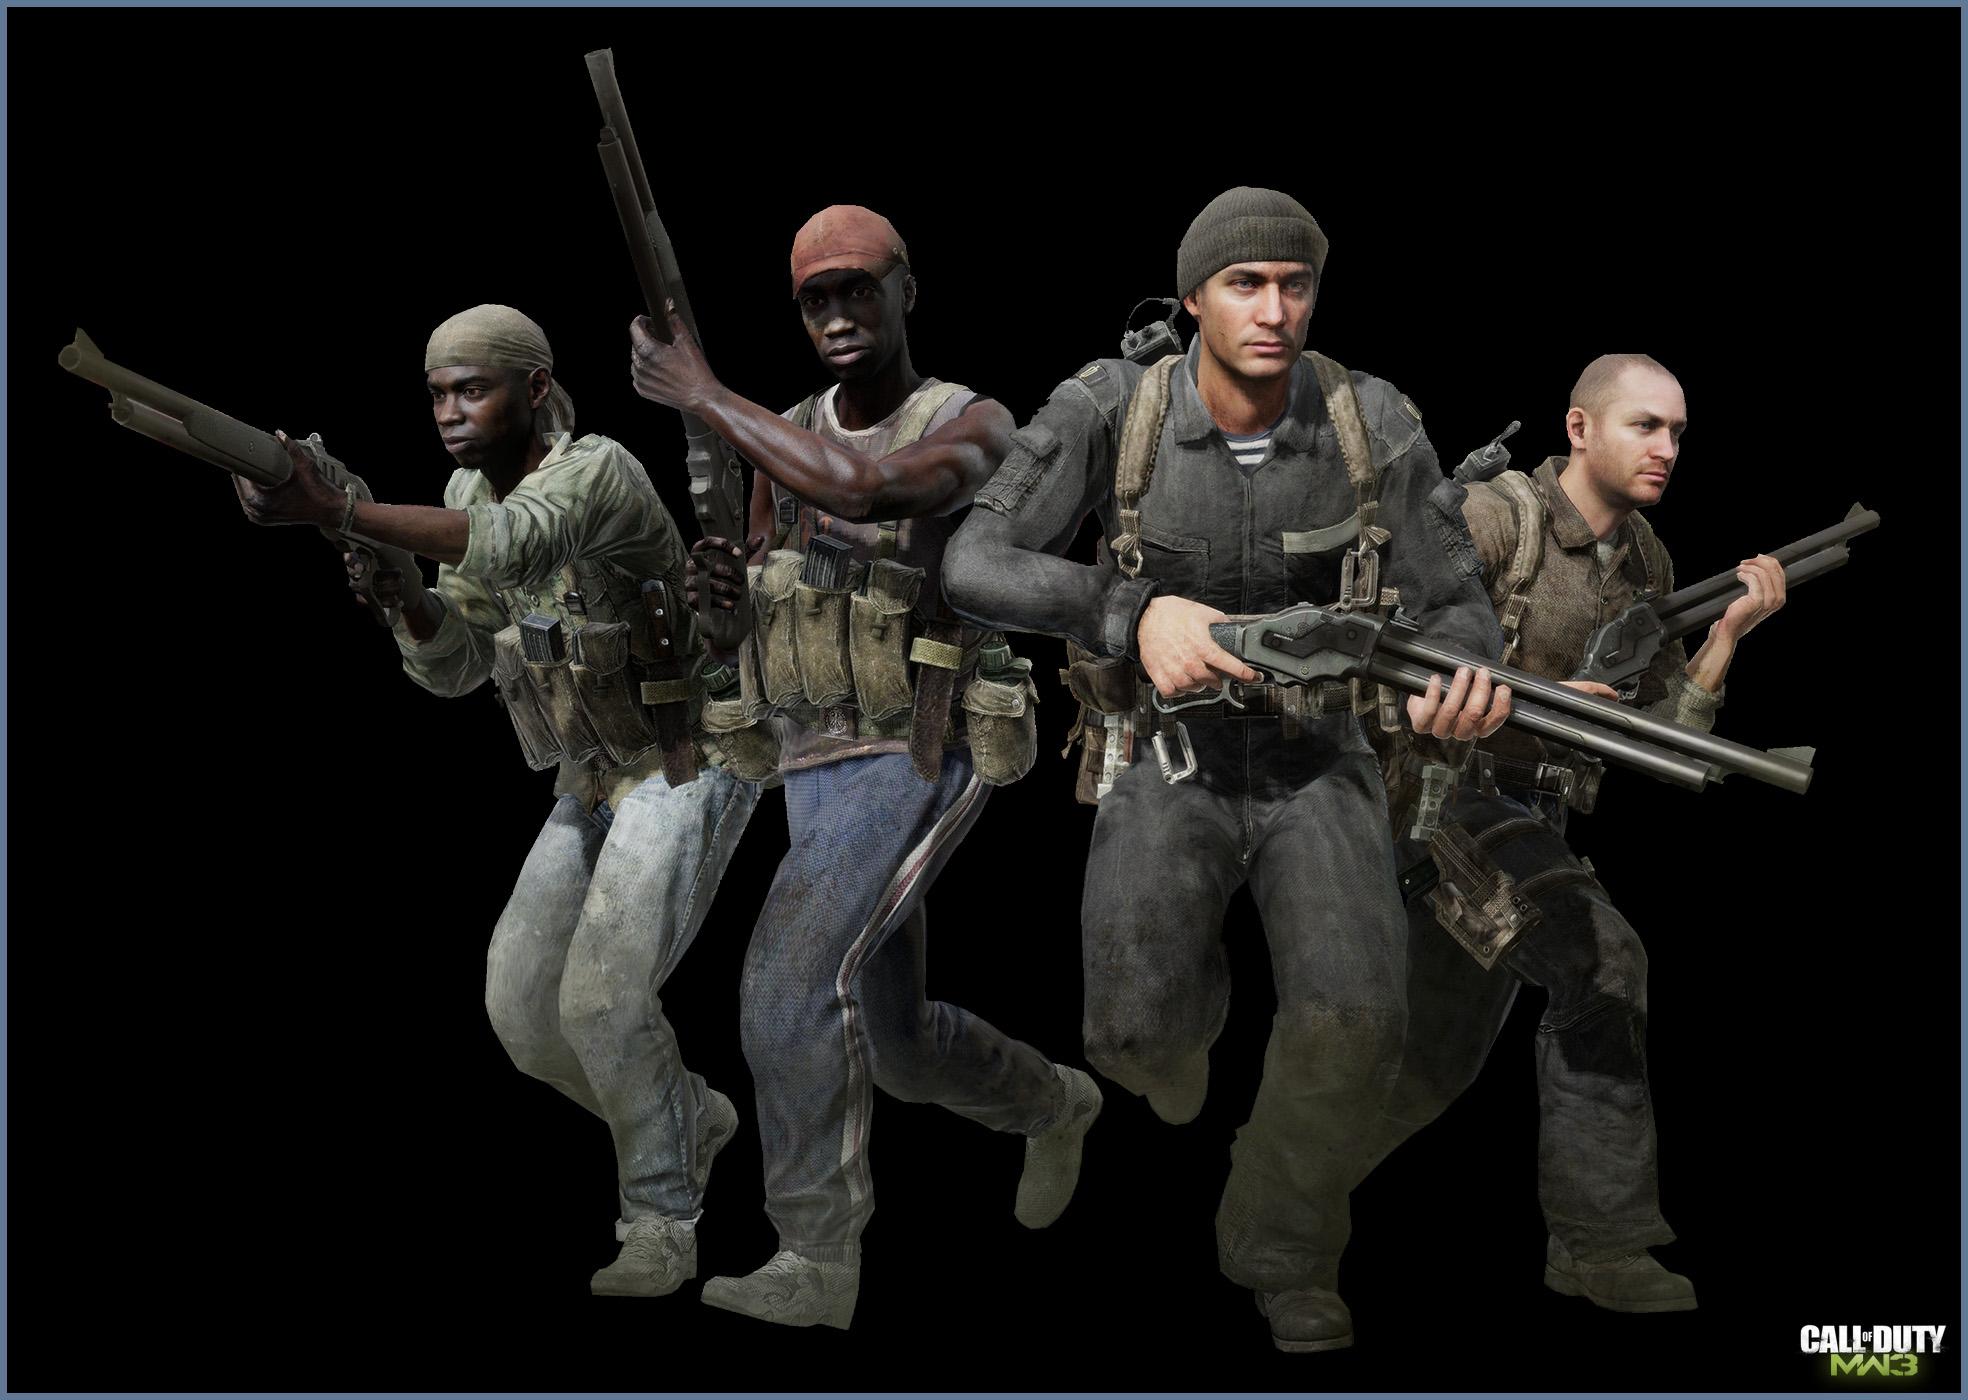 Call Of Duty Modern Warfare 3 Posed Characters Art Jake L